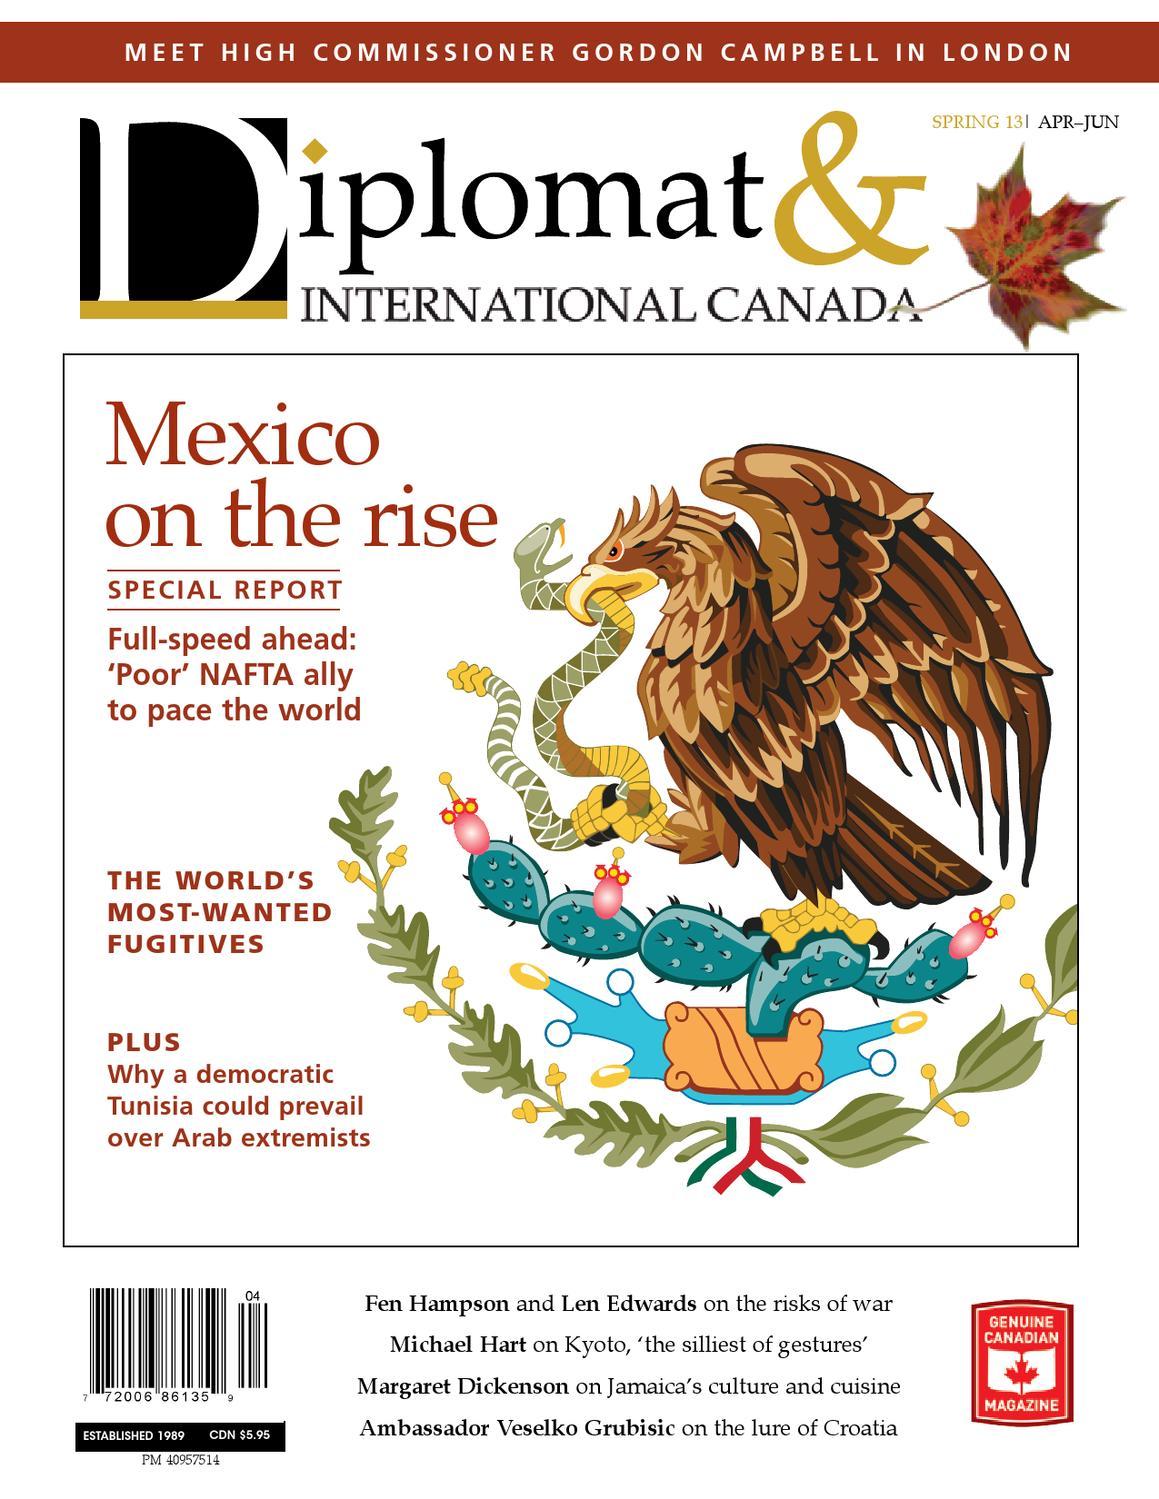 Diplomat Magazine Spring 2013 By Diplomatonline Com Diplomatonline  # Muebles Nova Luxe Zacatecas